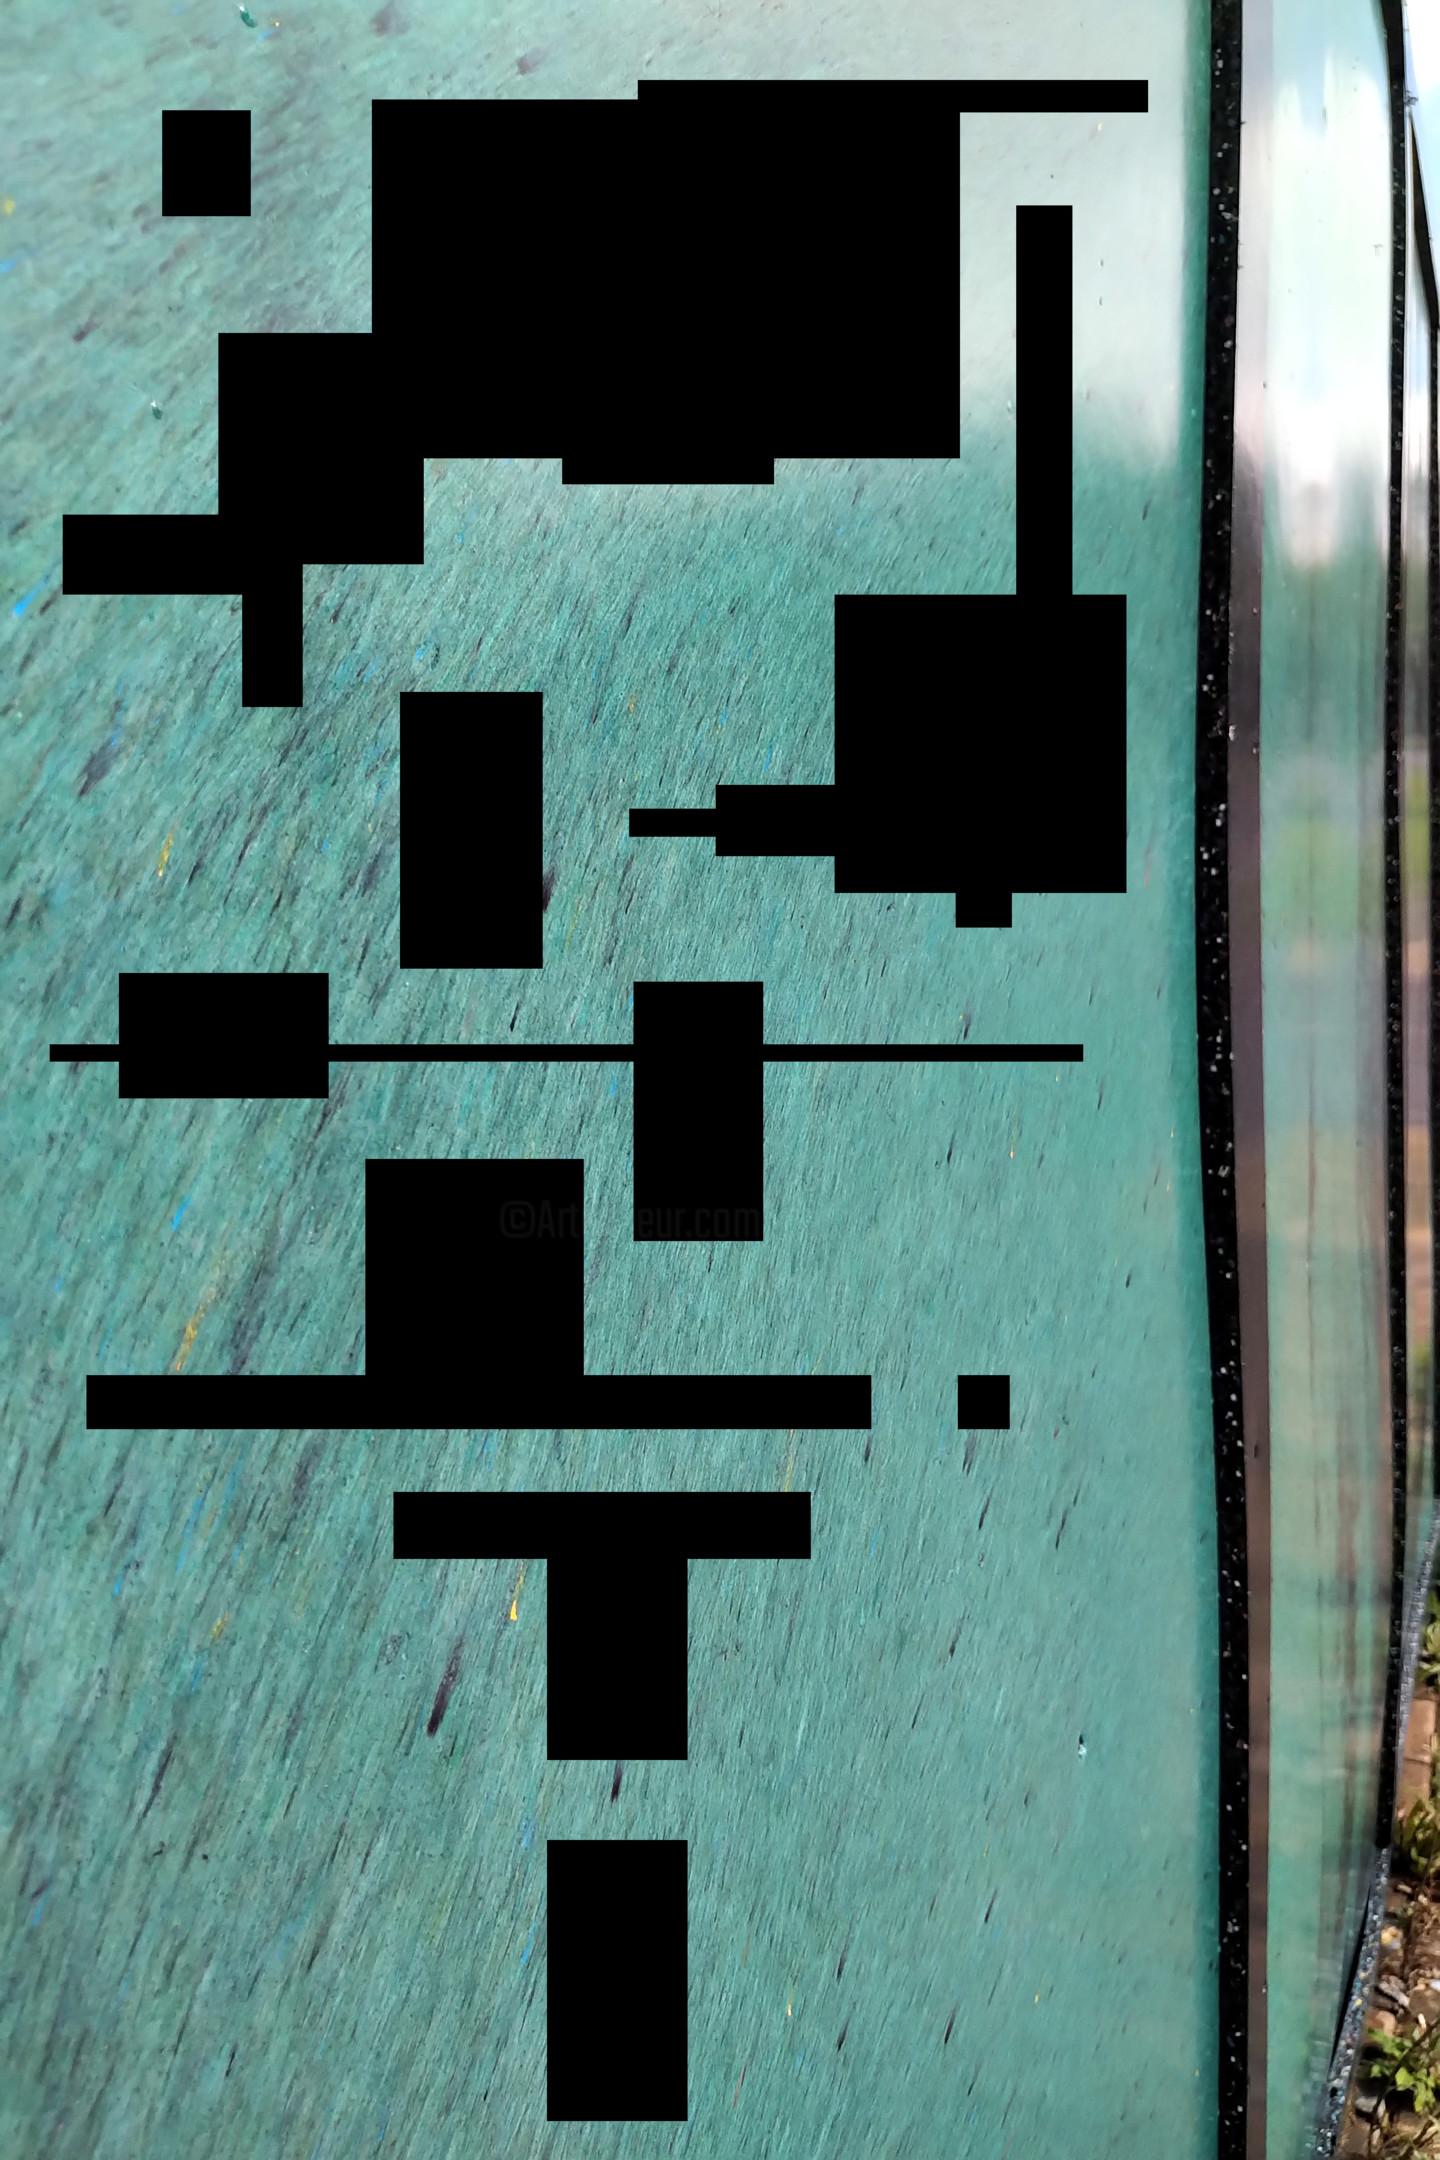 Gerald Shepherd - Oblong Improvisation